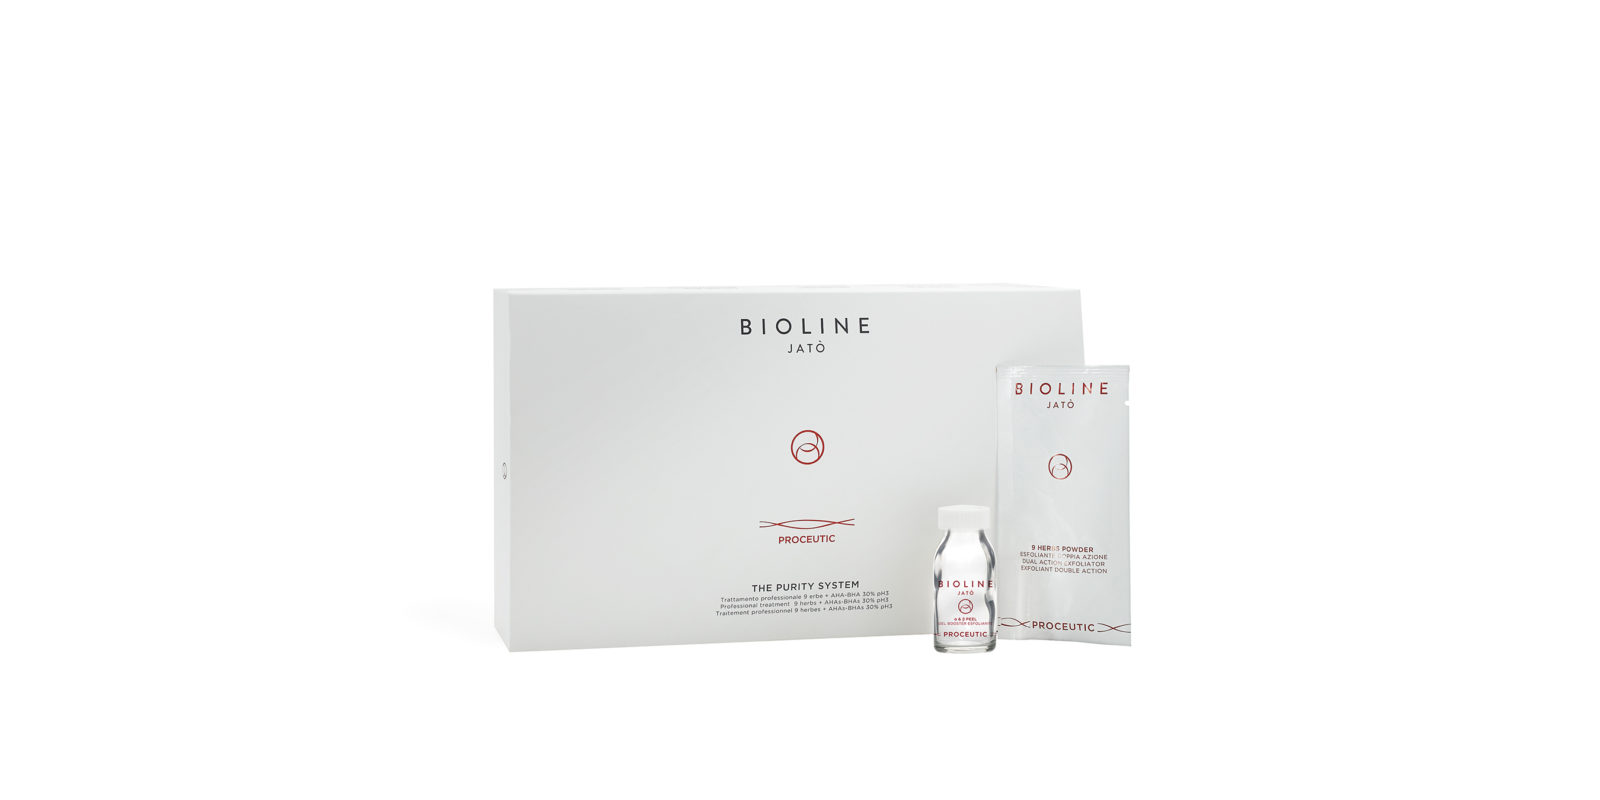 Bioline Jatò Proceutic 9 Herbs Powder Esfoliante